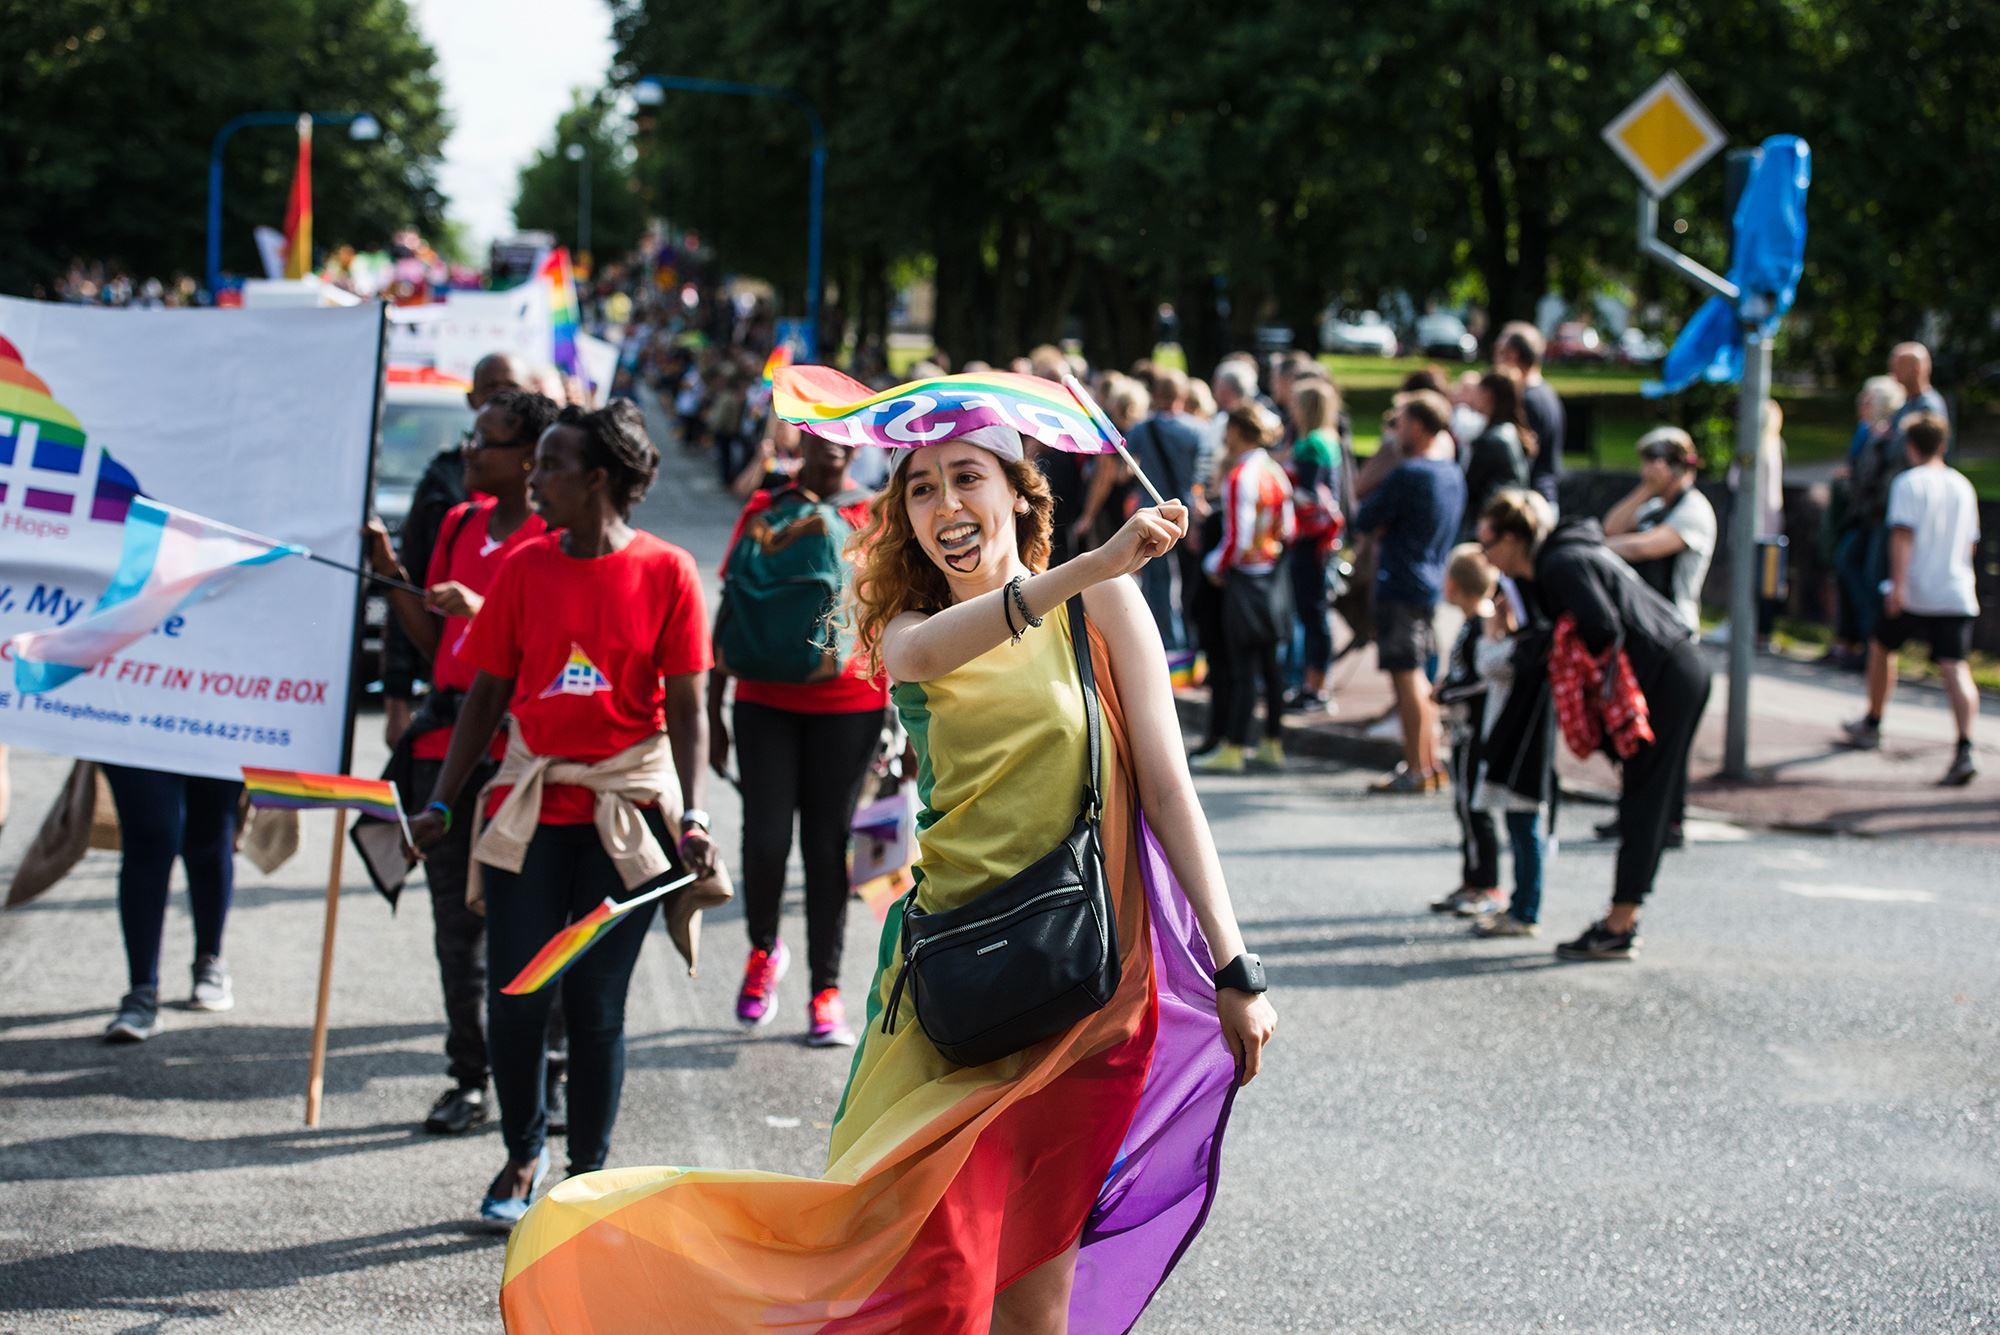 Gävle Pride 2018, Pridedagarna, Paraden